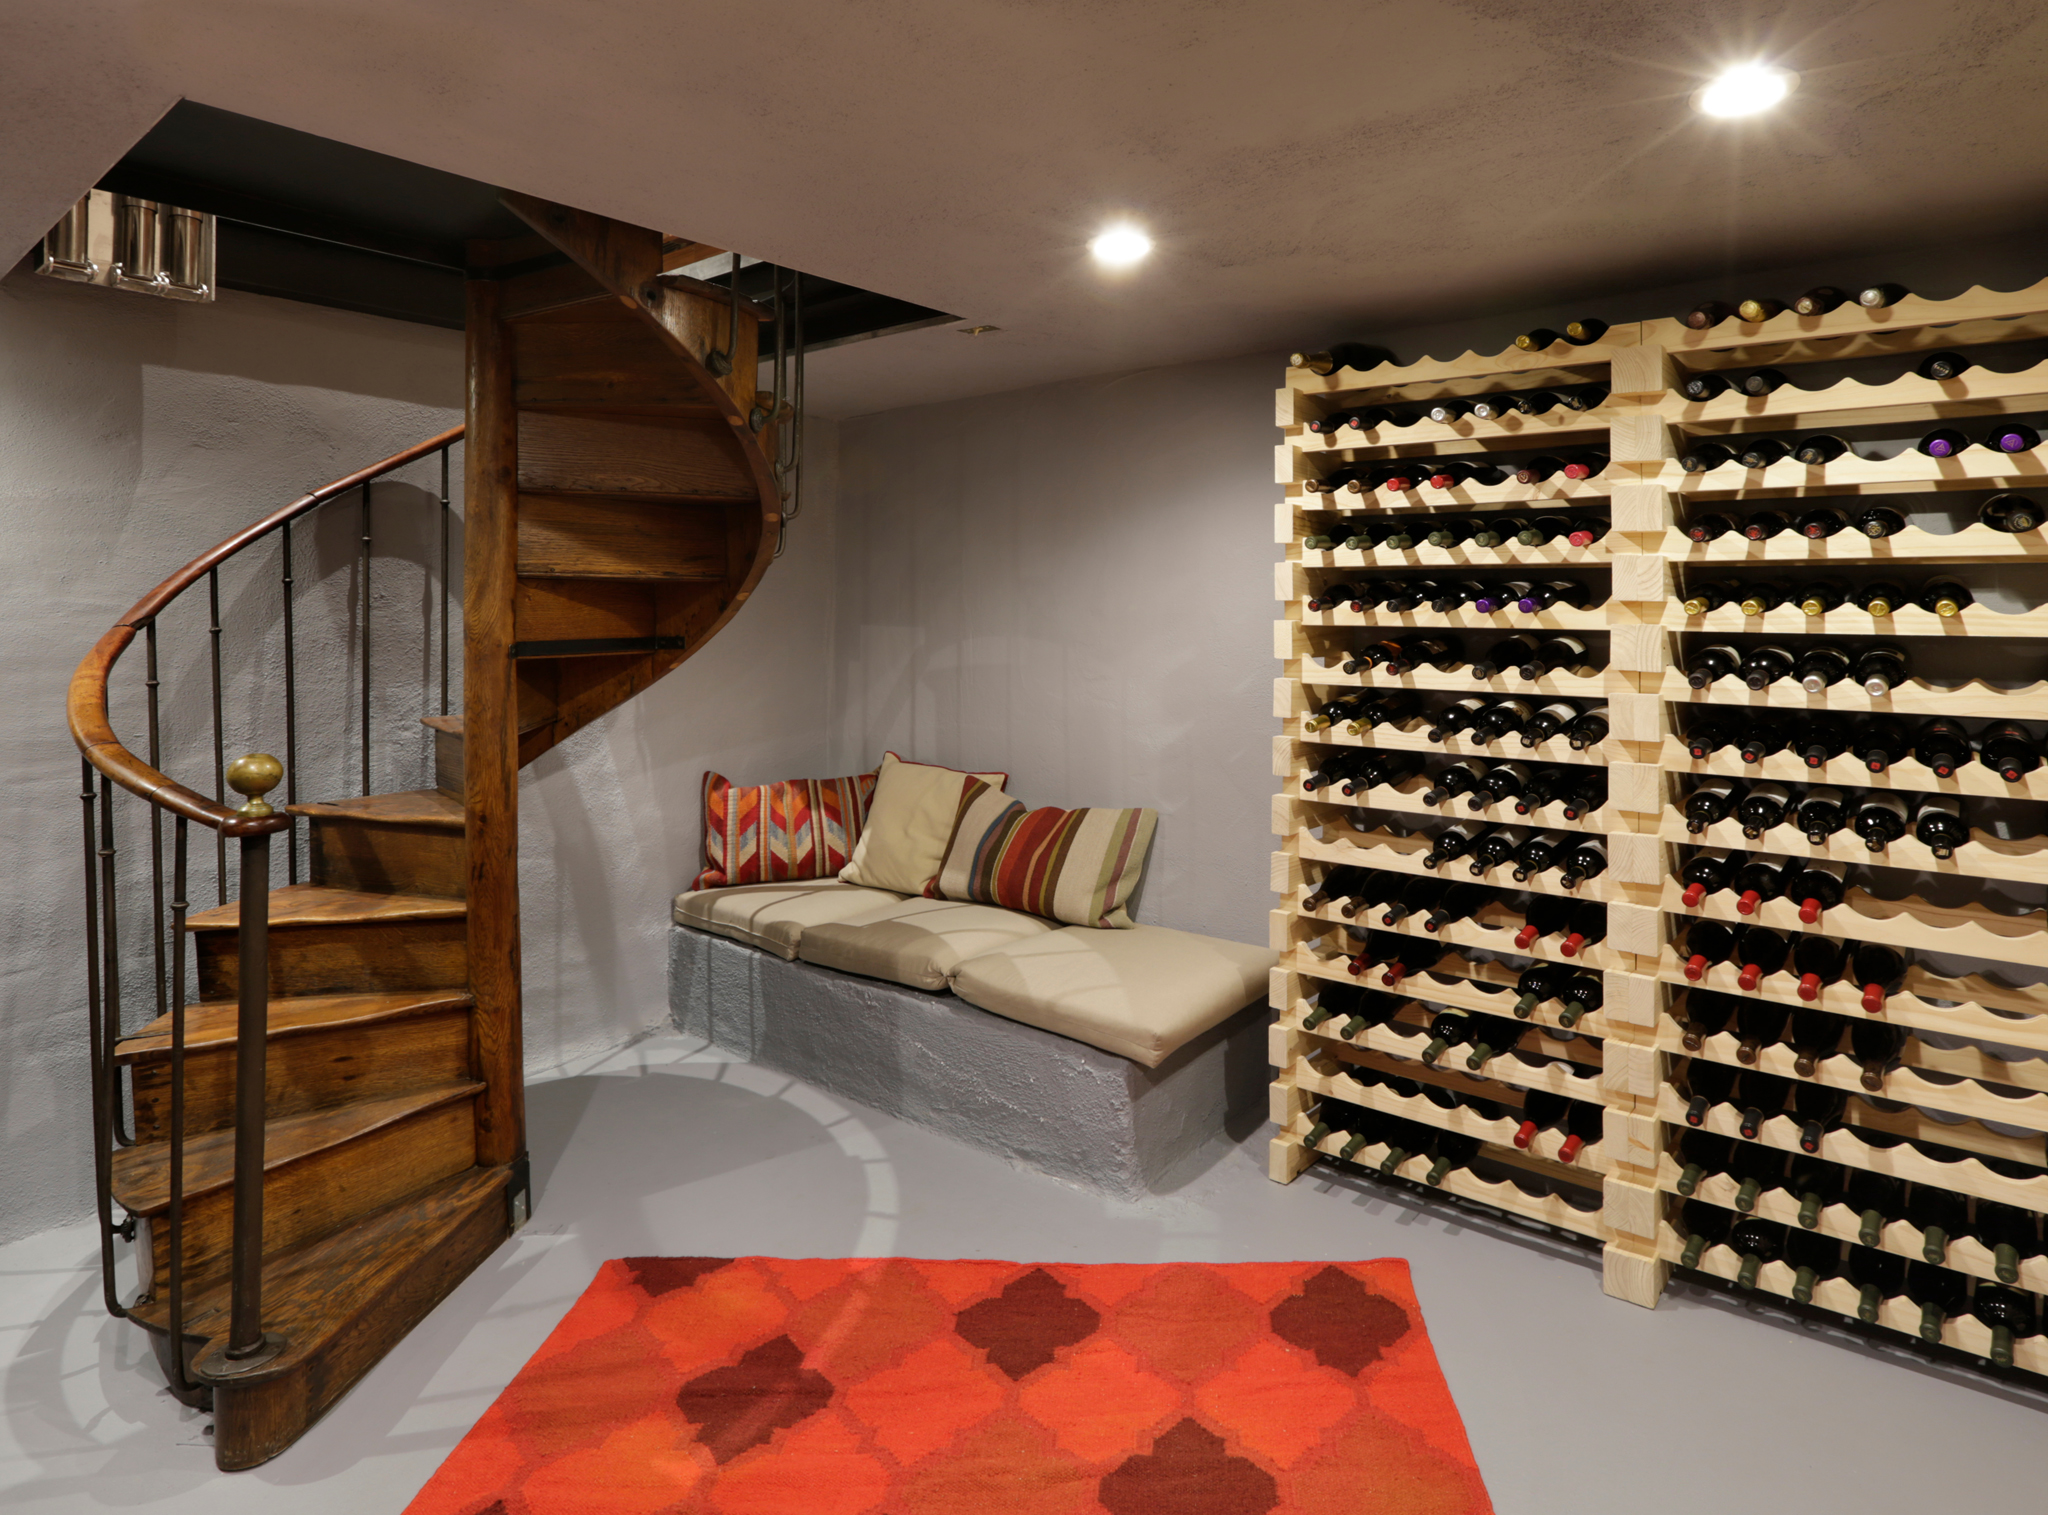 Seneca_wineroom.jpg